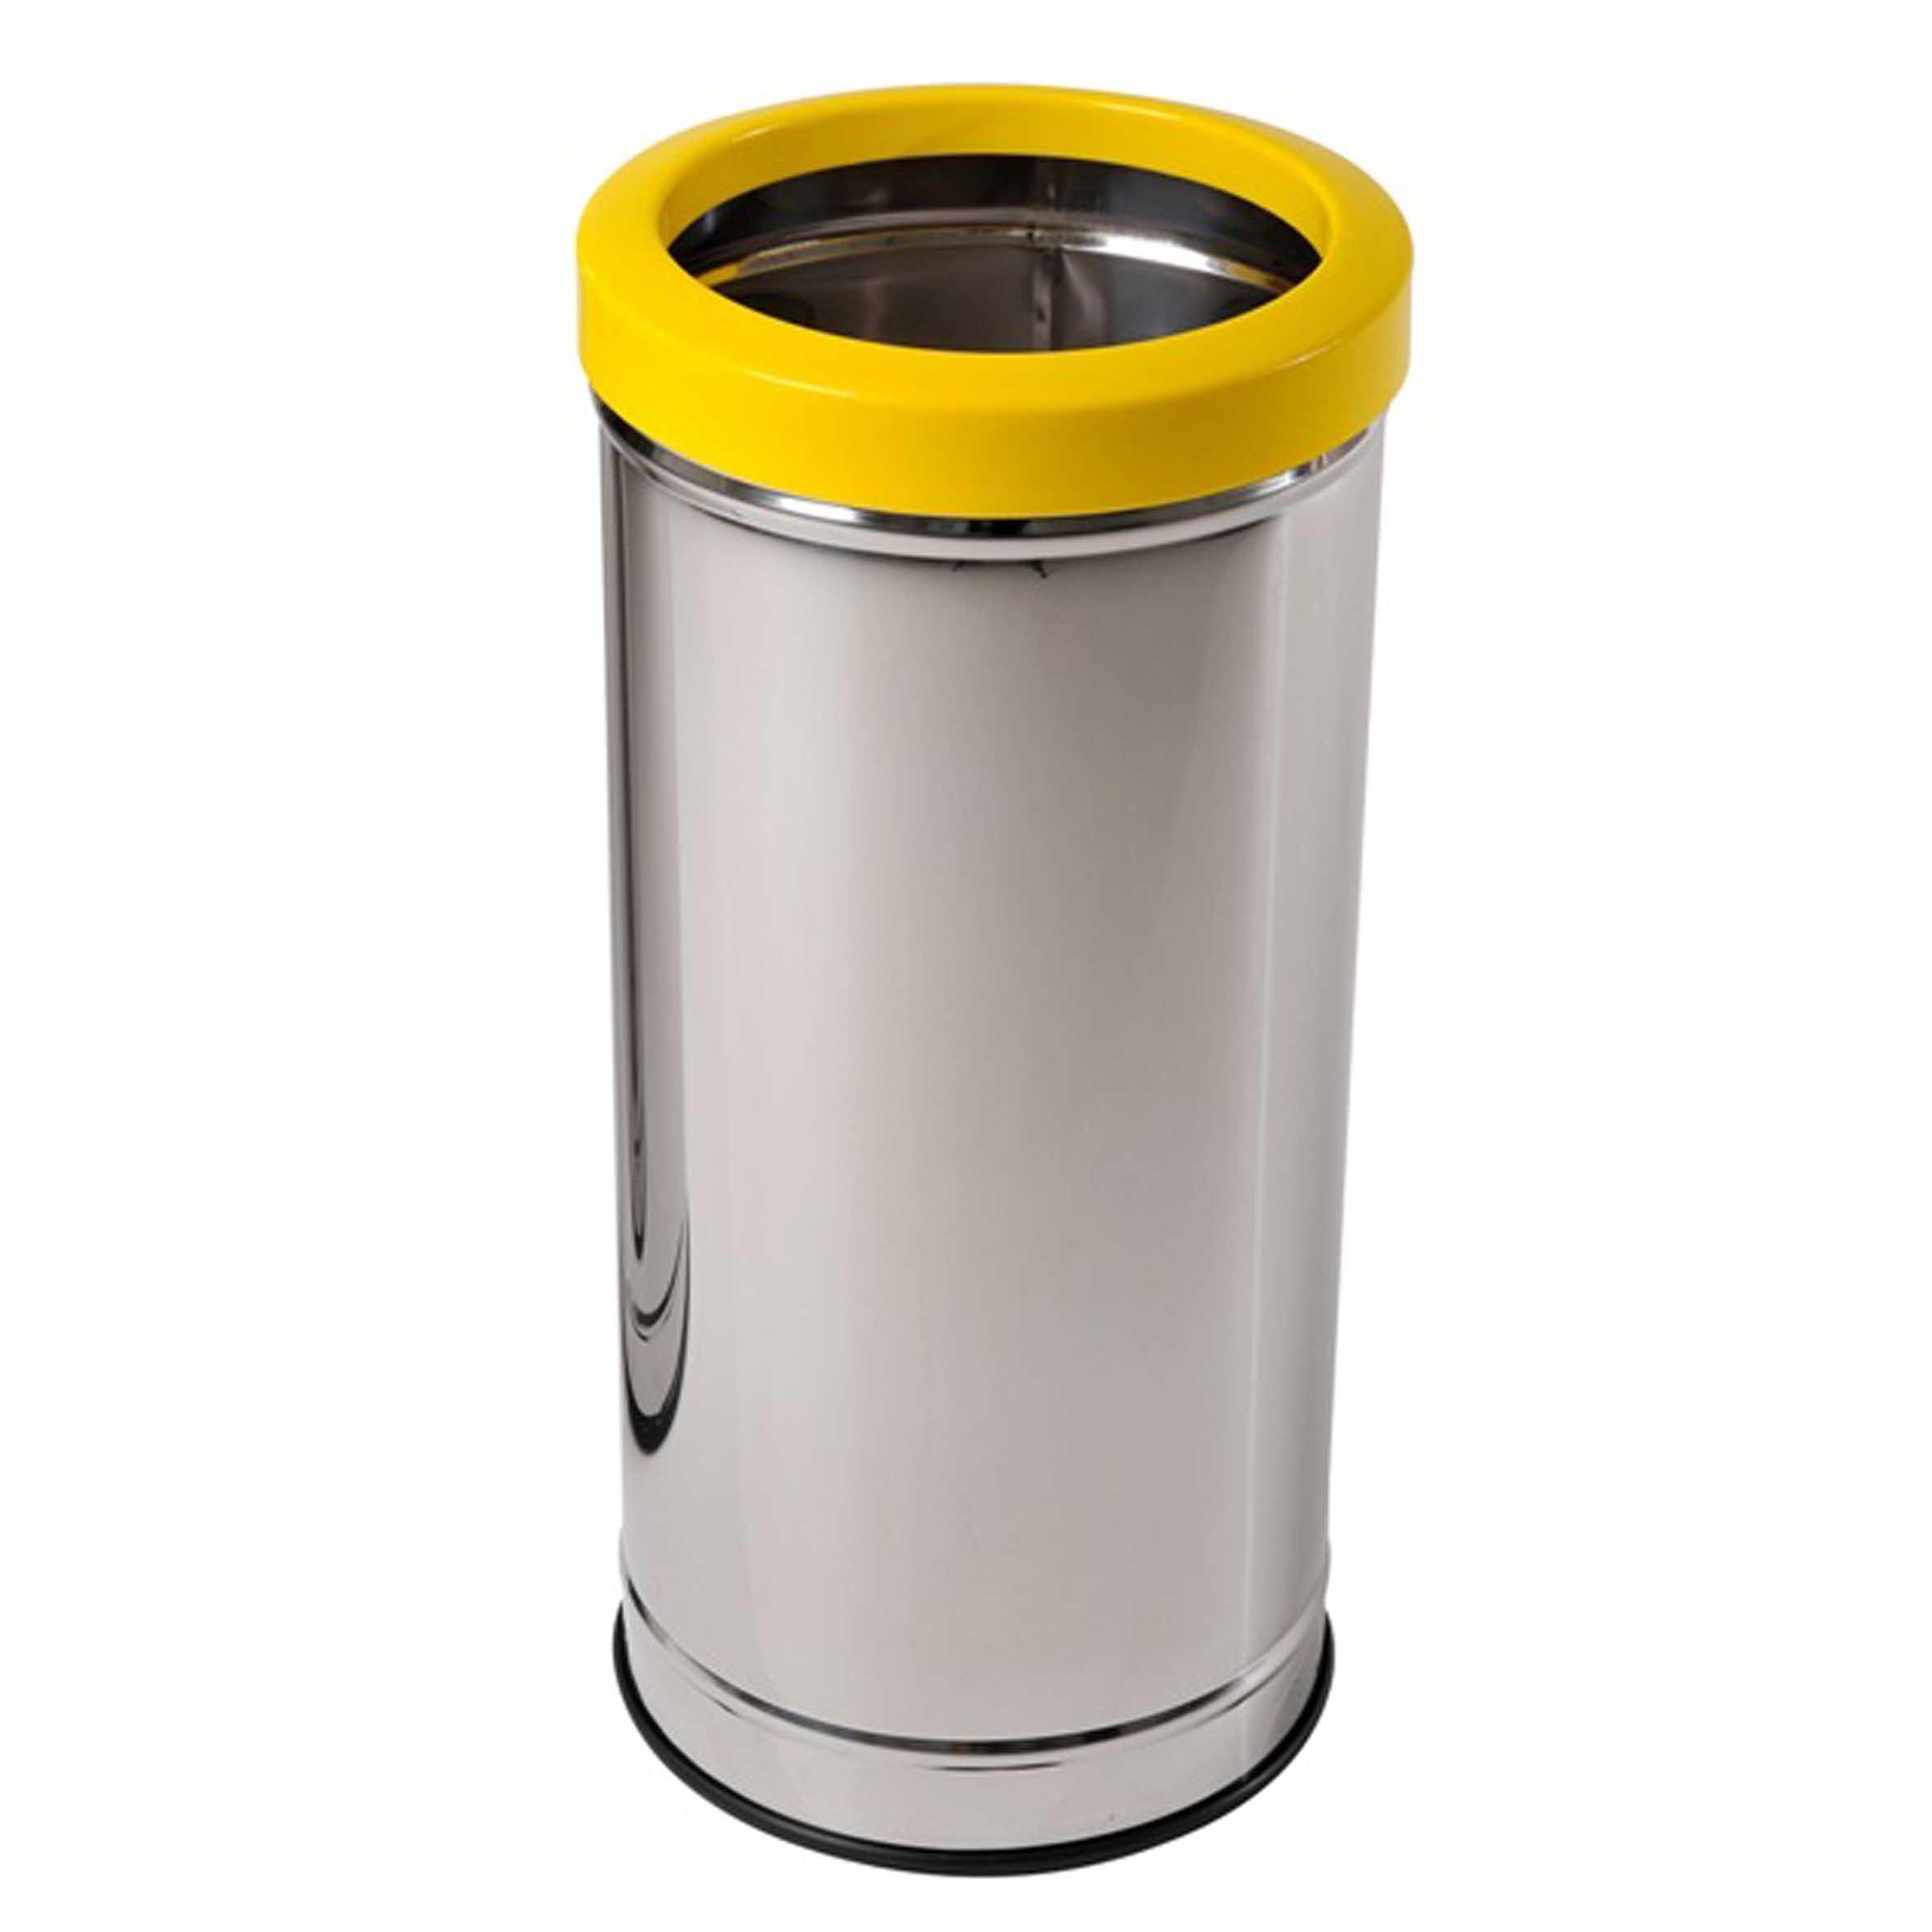 Lixeira Inox com Aro Plástico - JSN